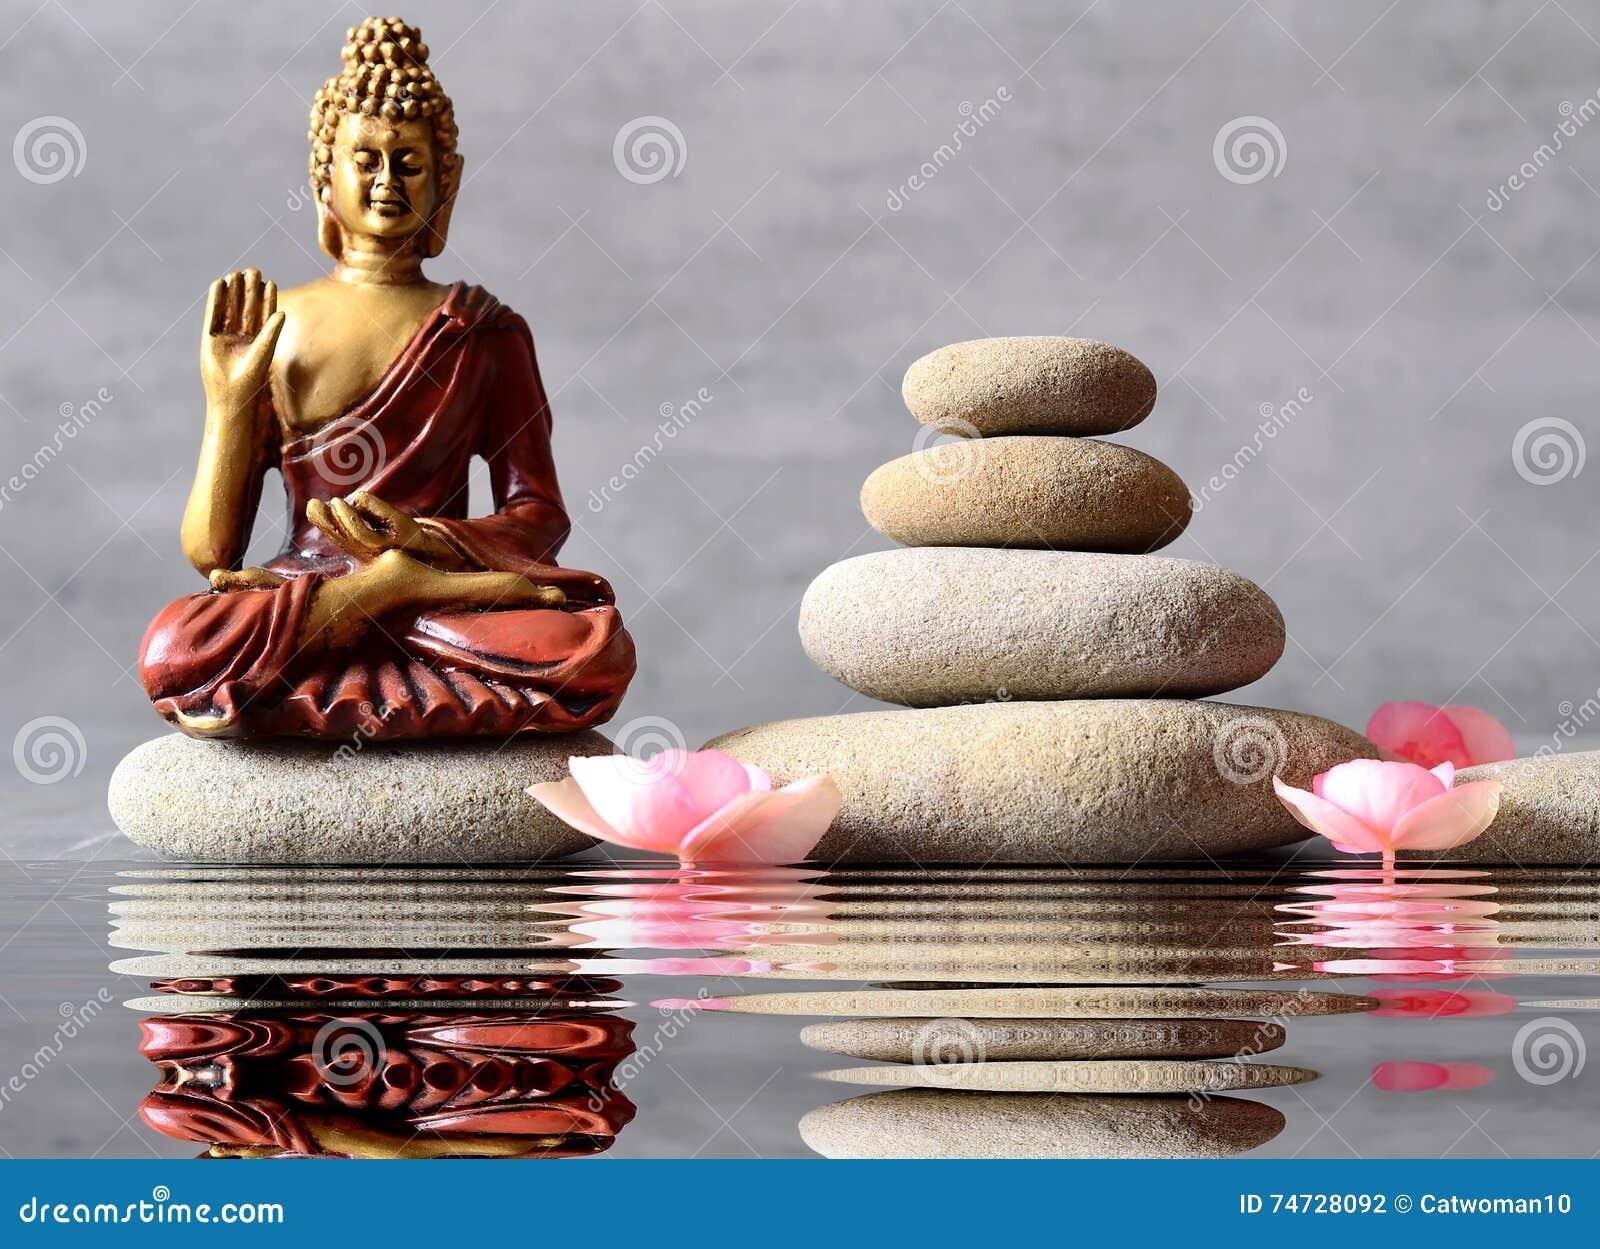 Japanese Garden Design Zen Stones